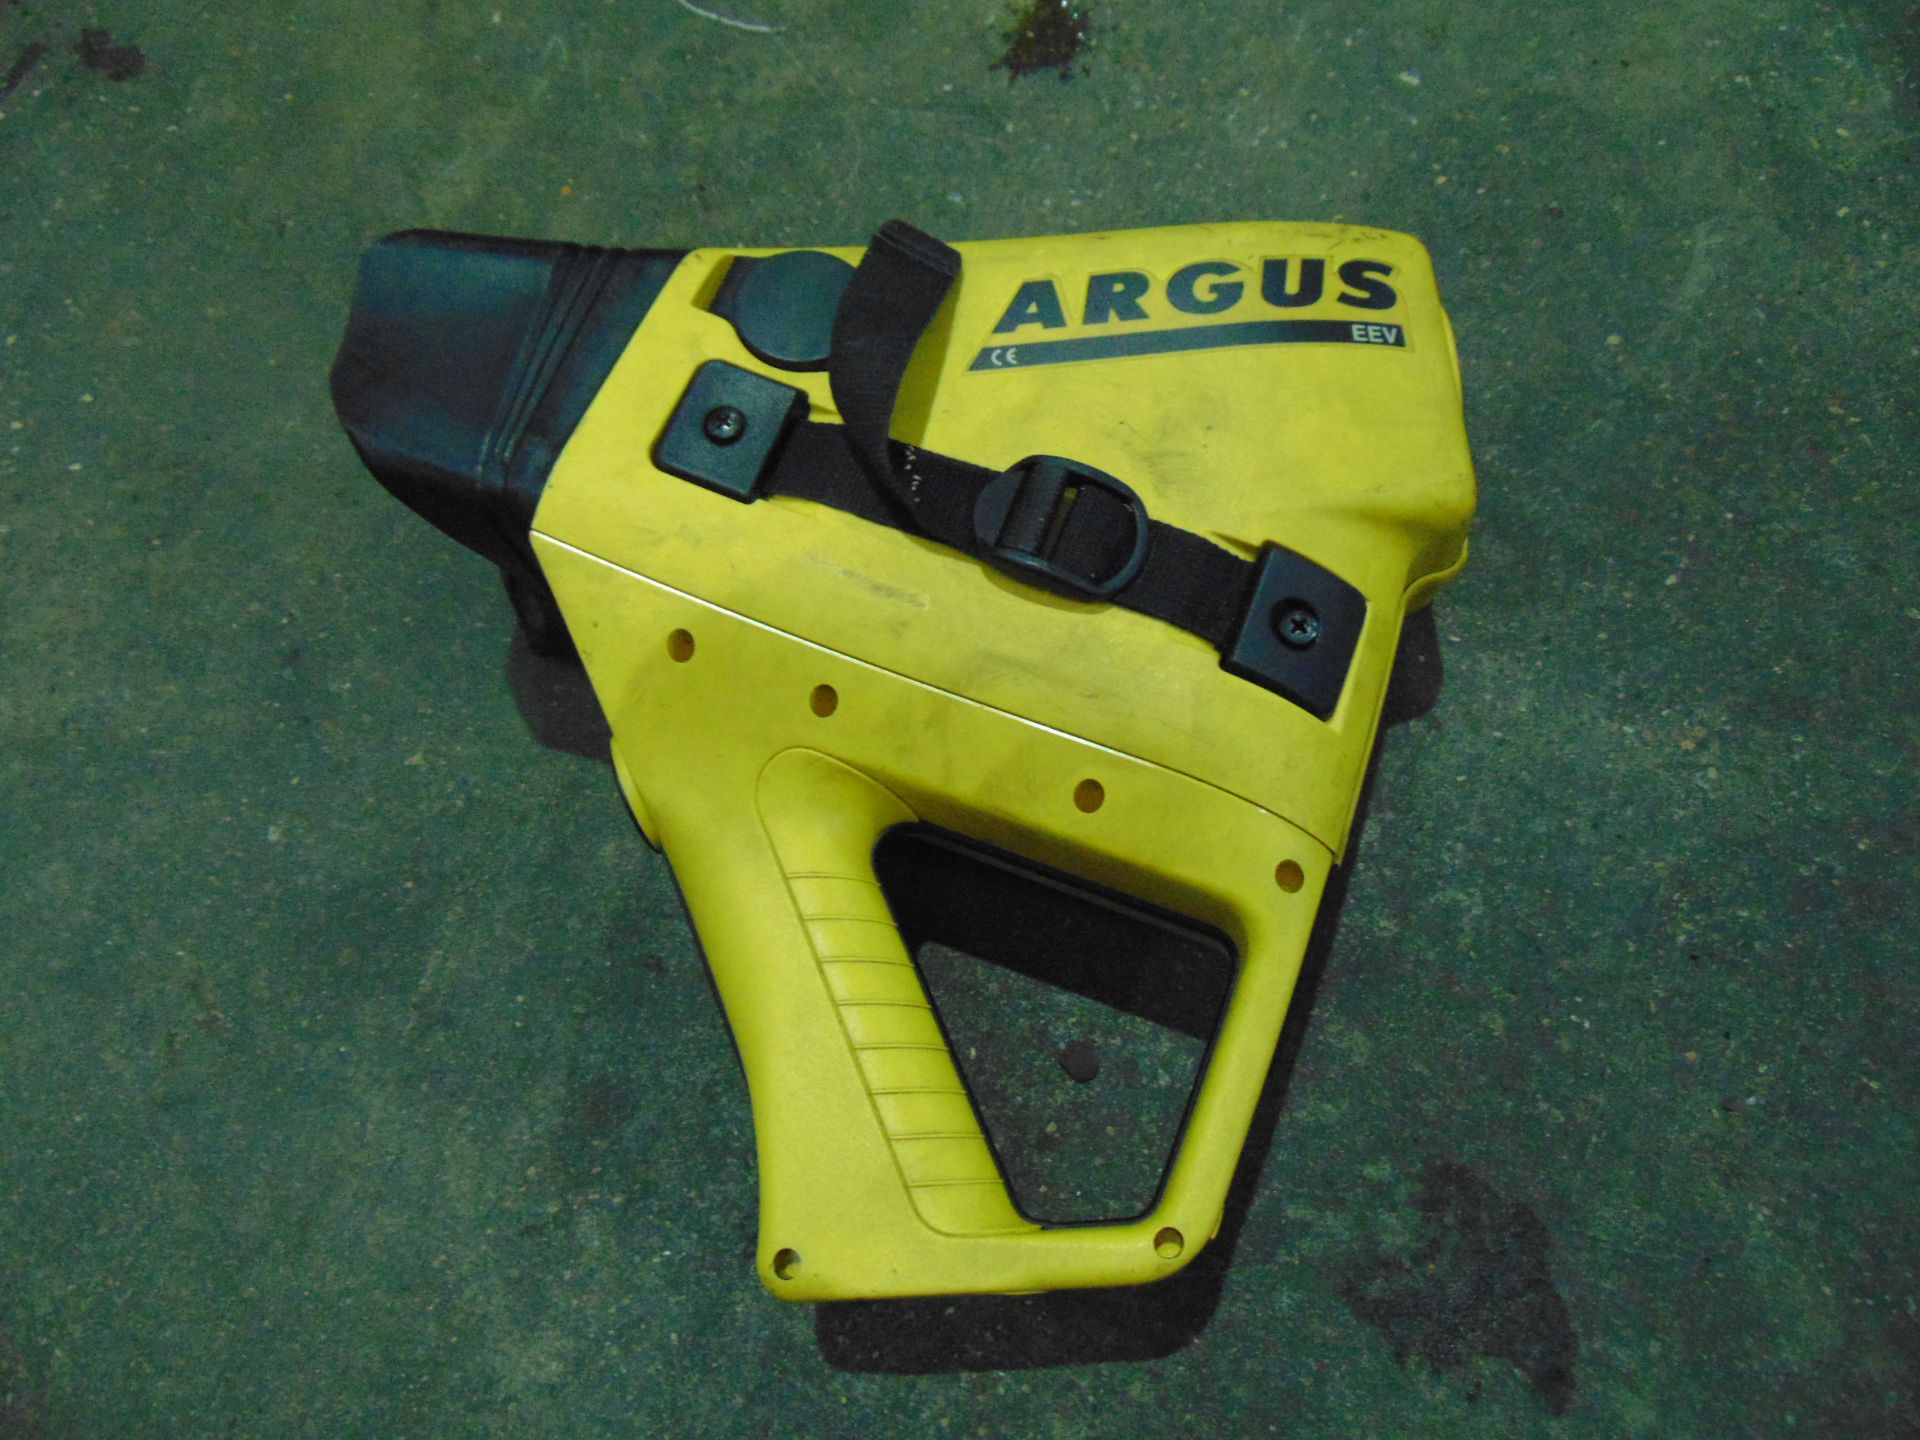 Lotto 26419 - Argus 2 Eev Thermal Imaging Camera